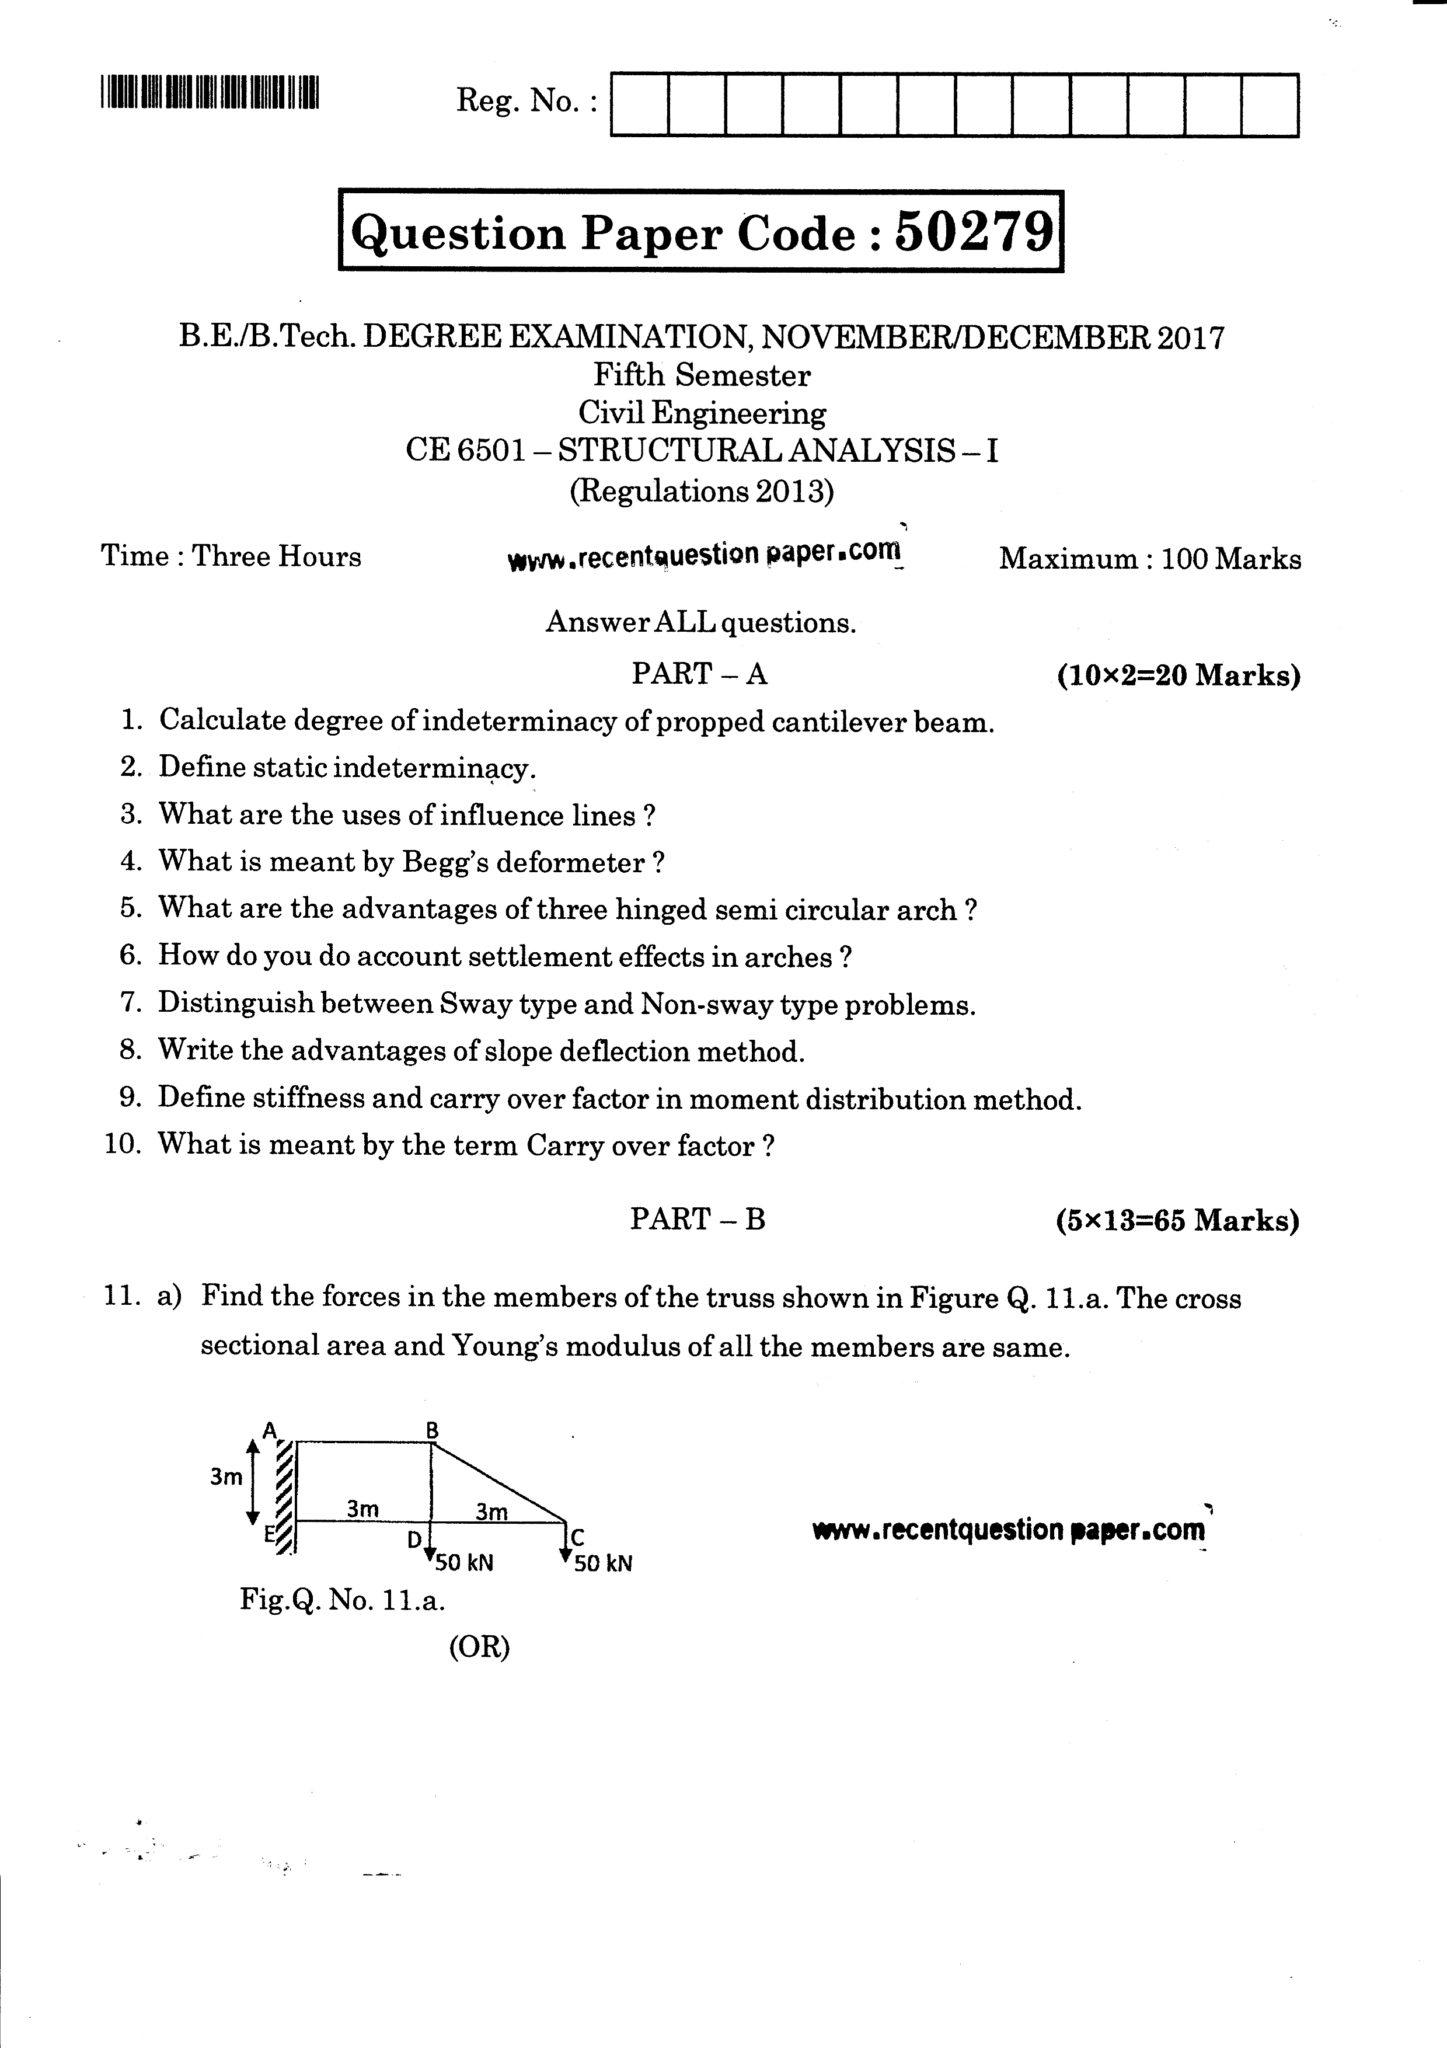 CE6501 Structural Analysis-I Question Paper Nov/Dec 2017